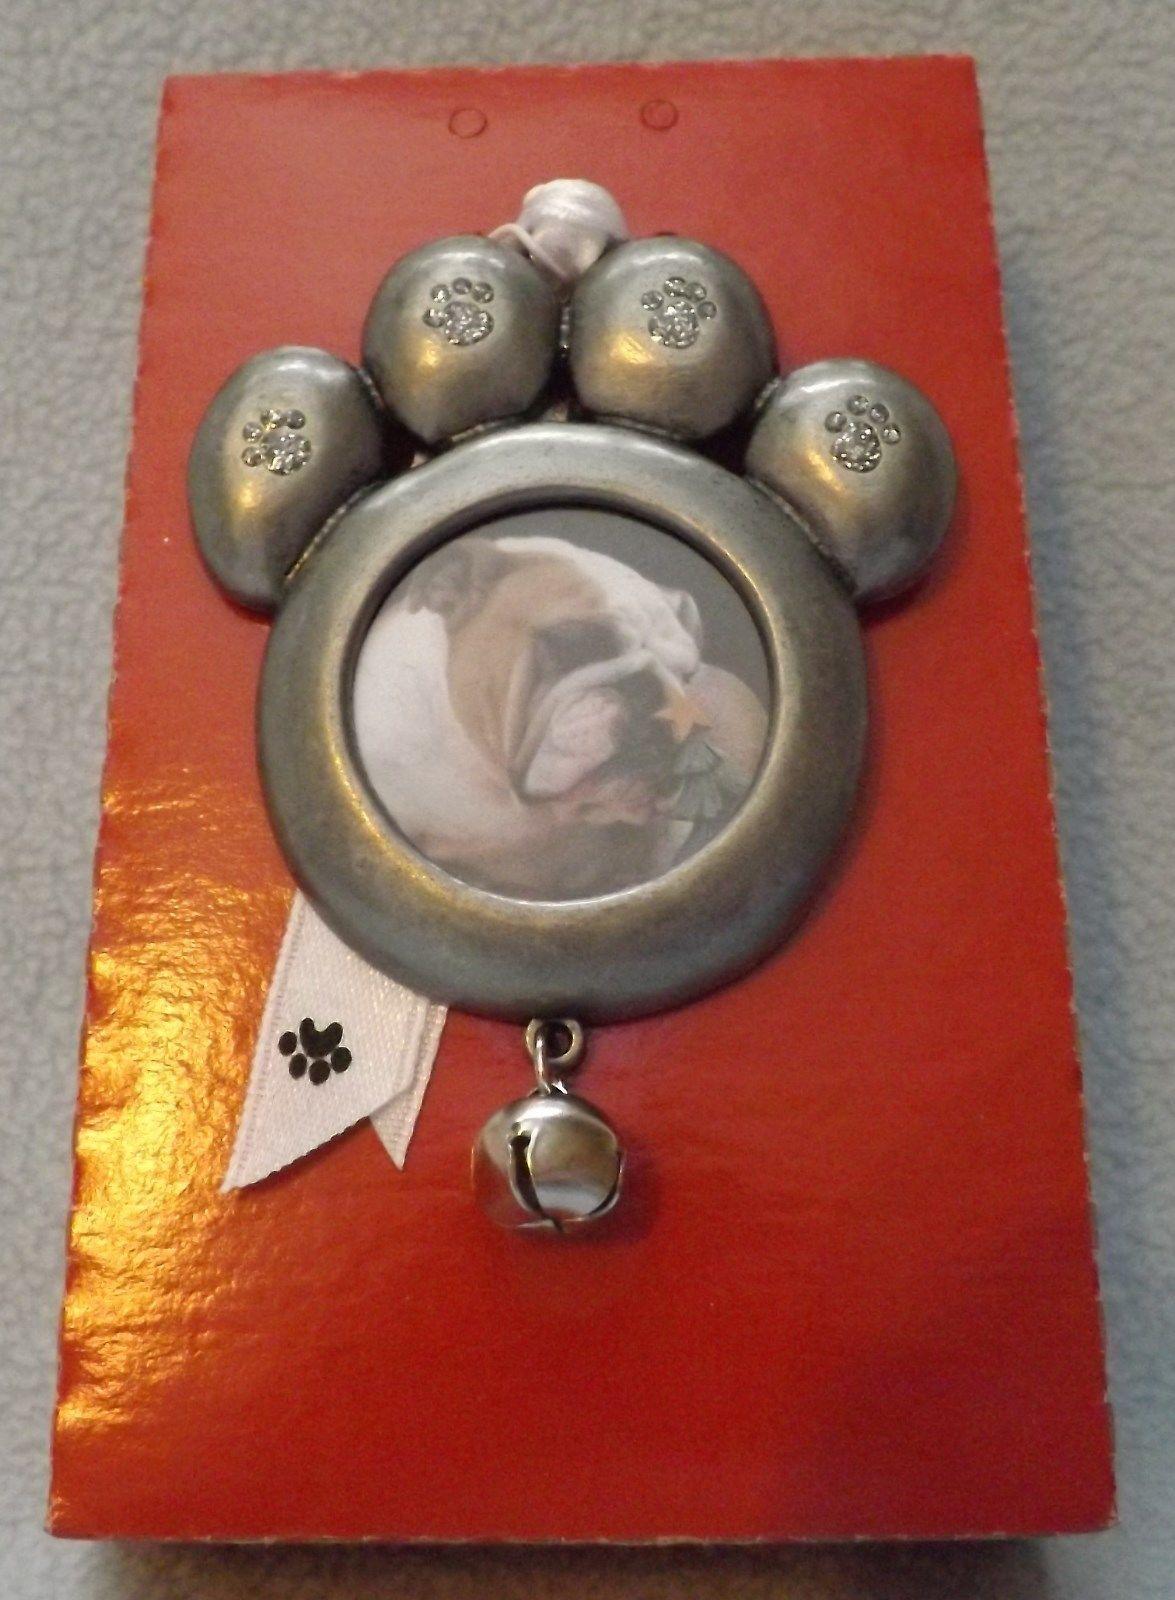 Pewter Pet Paw Photo Ornament by Gloria Duchin Inc